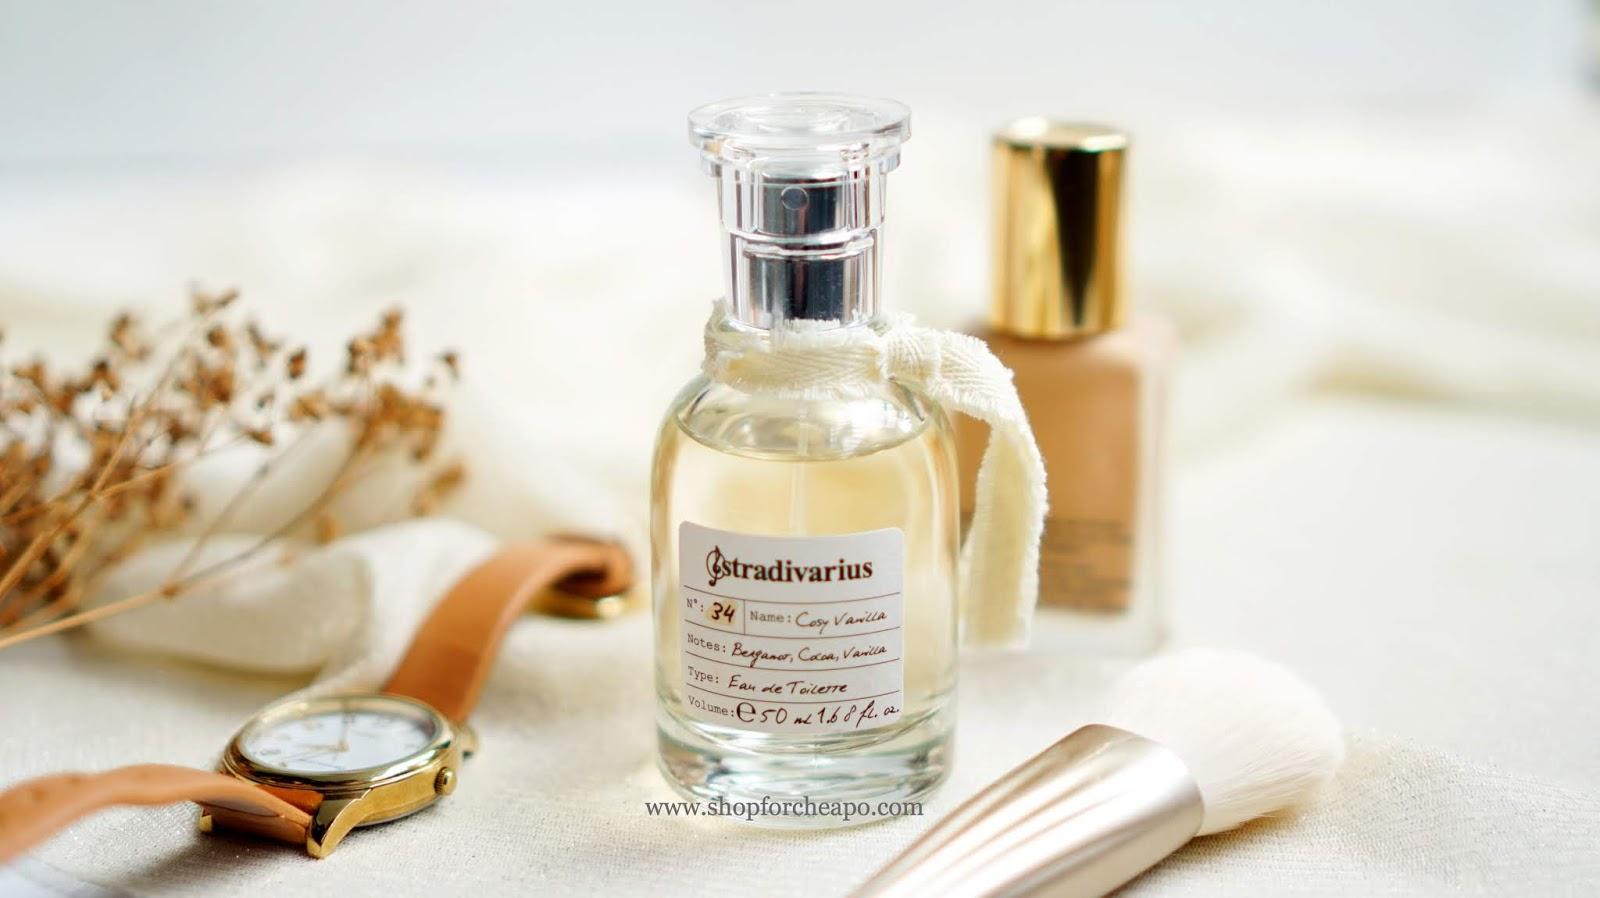 Review parfum Stradivarius No 34 Cosy Vanilla Eau De Toilette